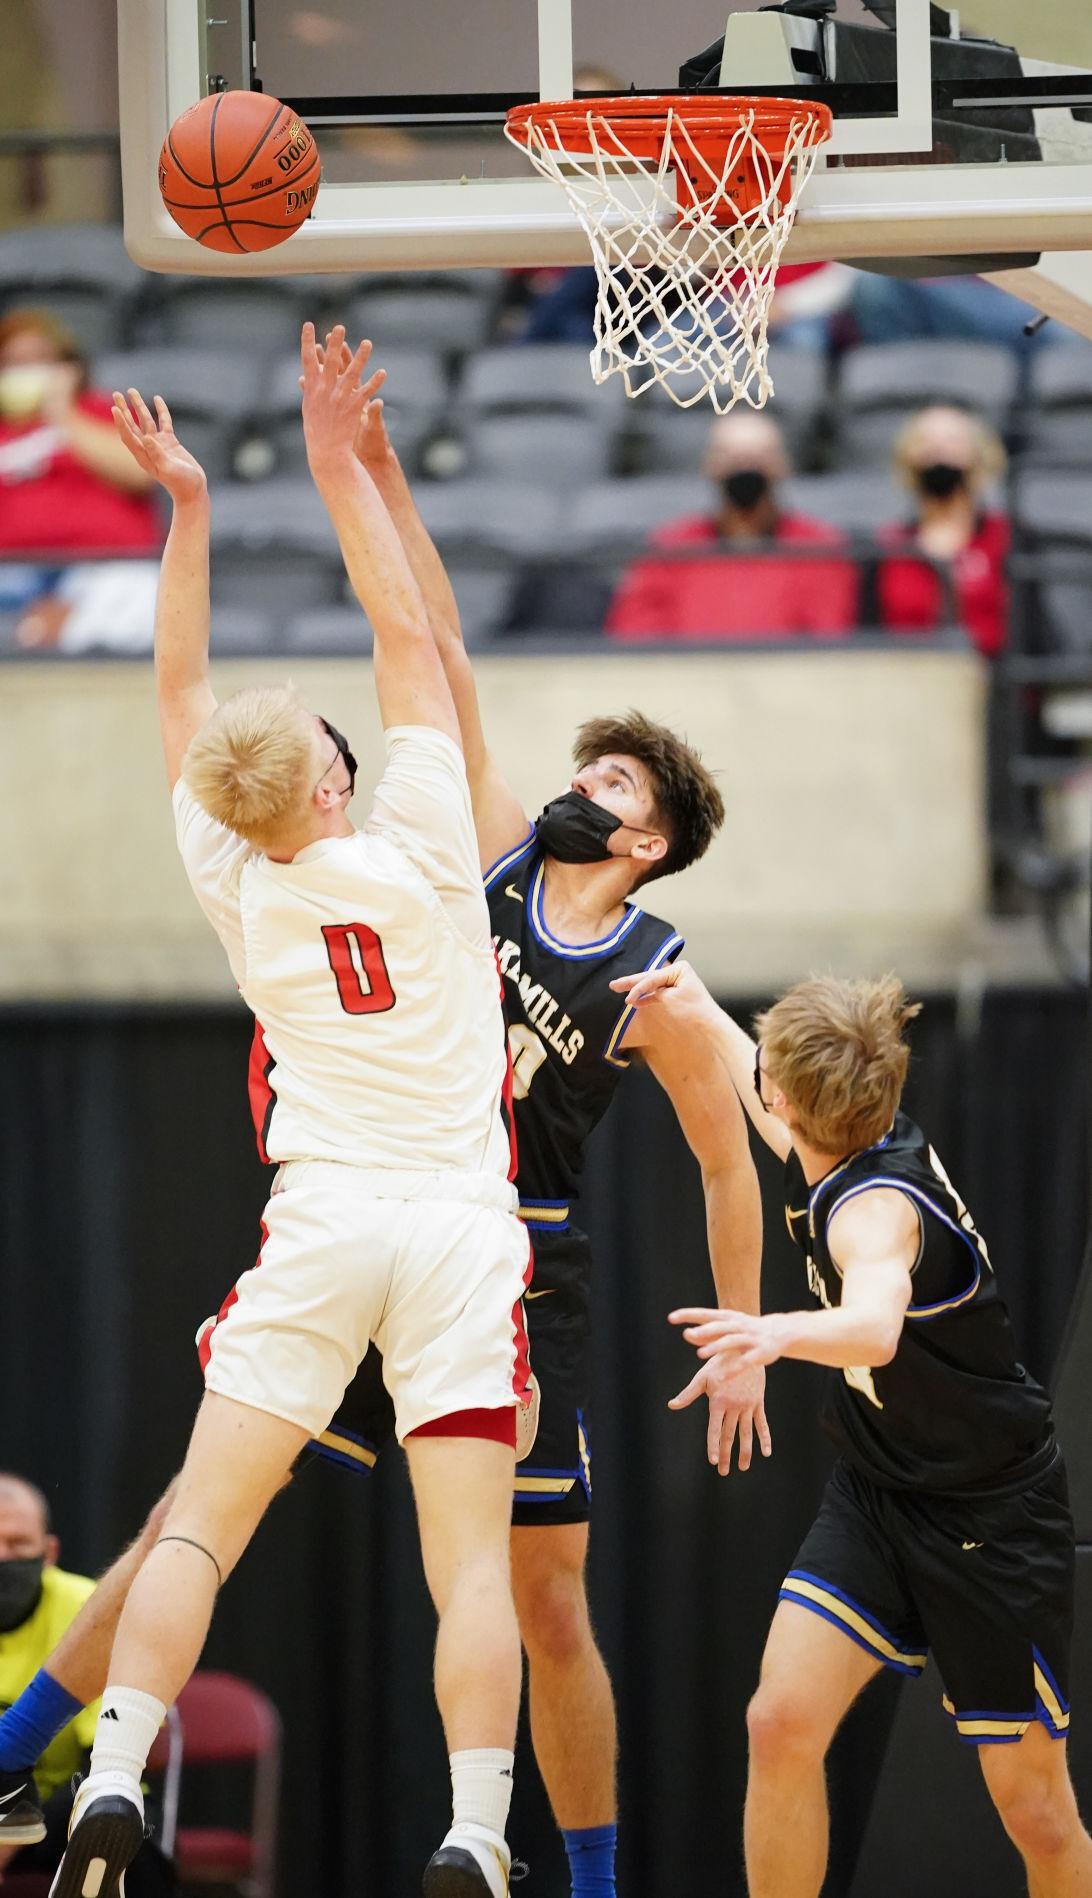 WIAA state boys basketball photo: Lake Mills' Jaxson Retrum goes up to defend a drive